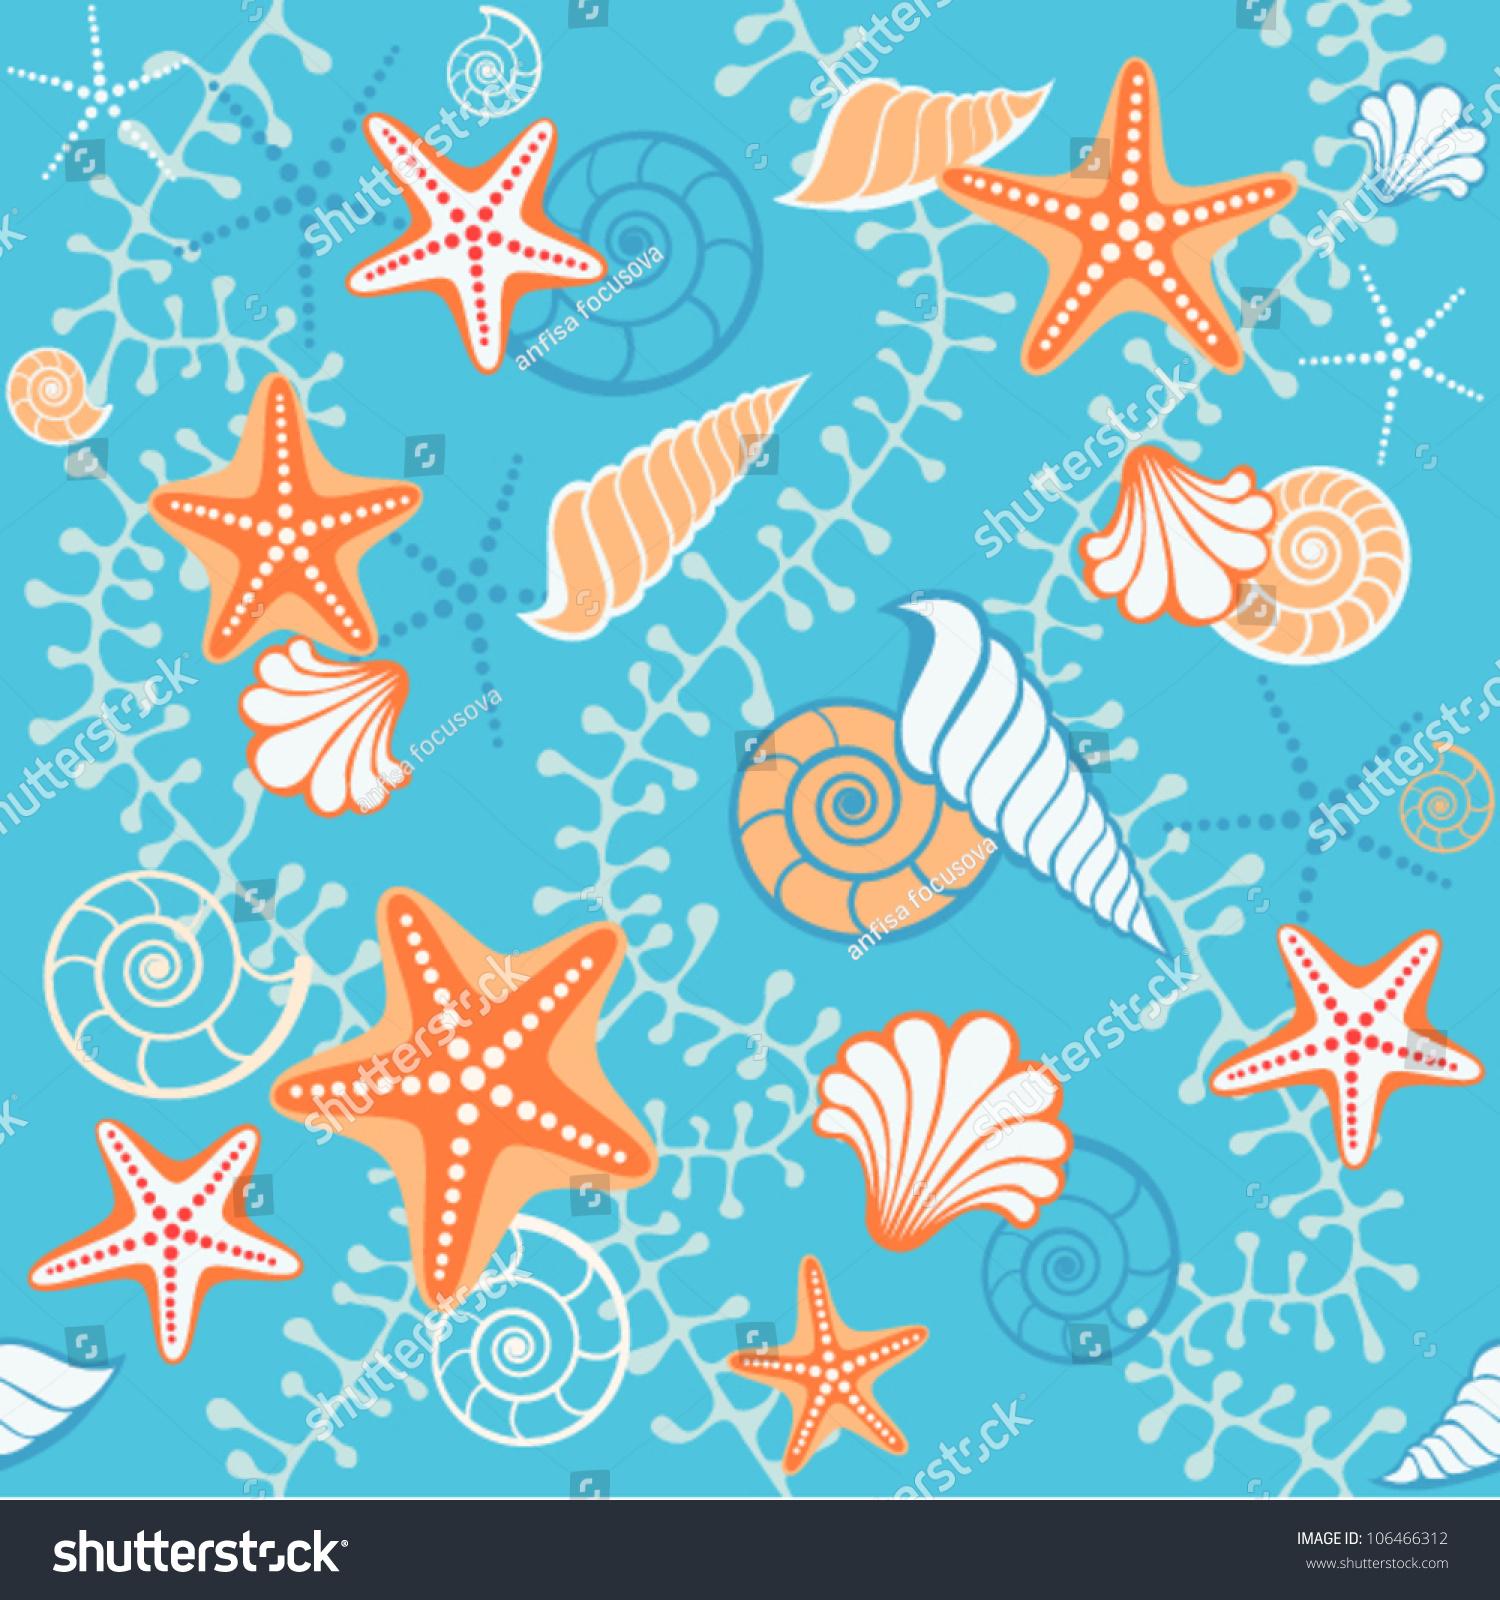 ocean fish wallpaper pattern - photo #23